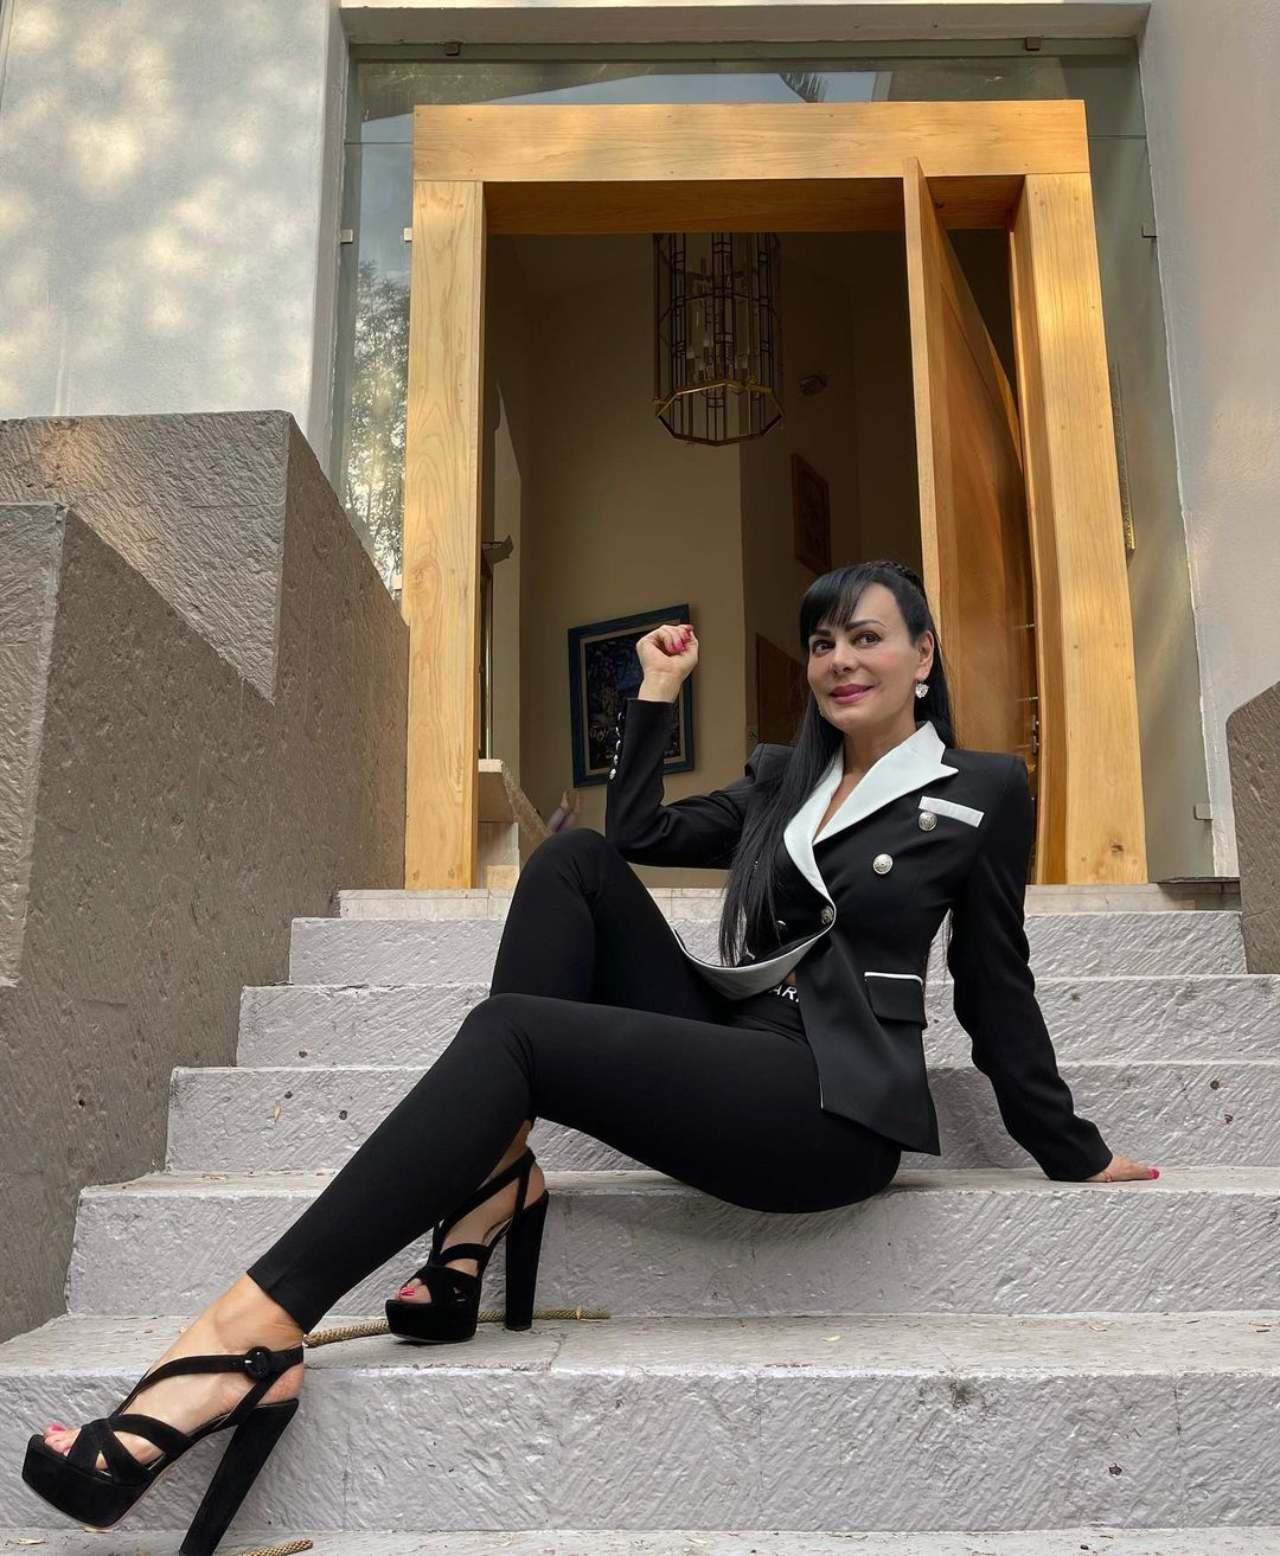 maribel Guardia con traje negro